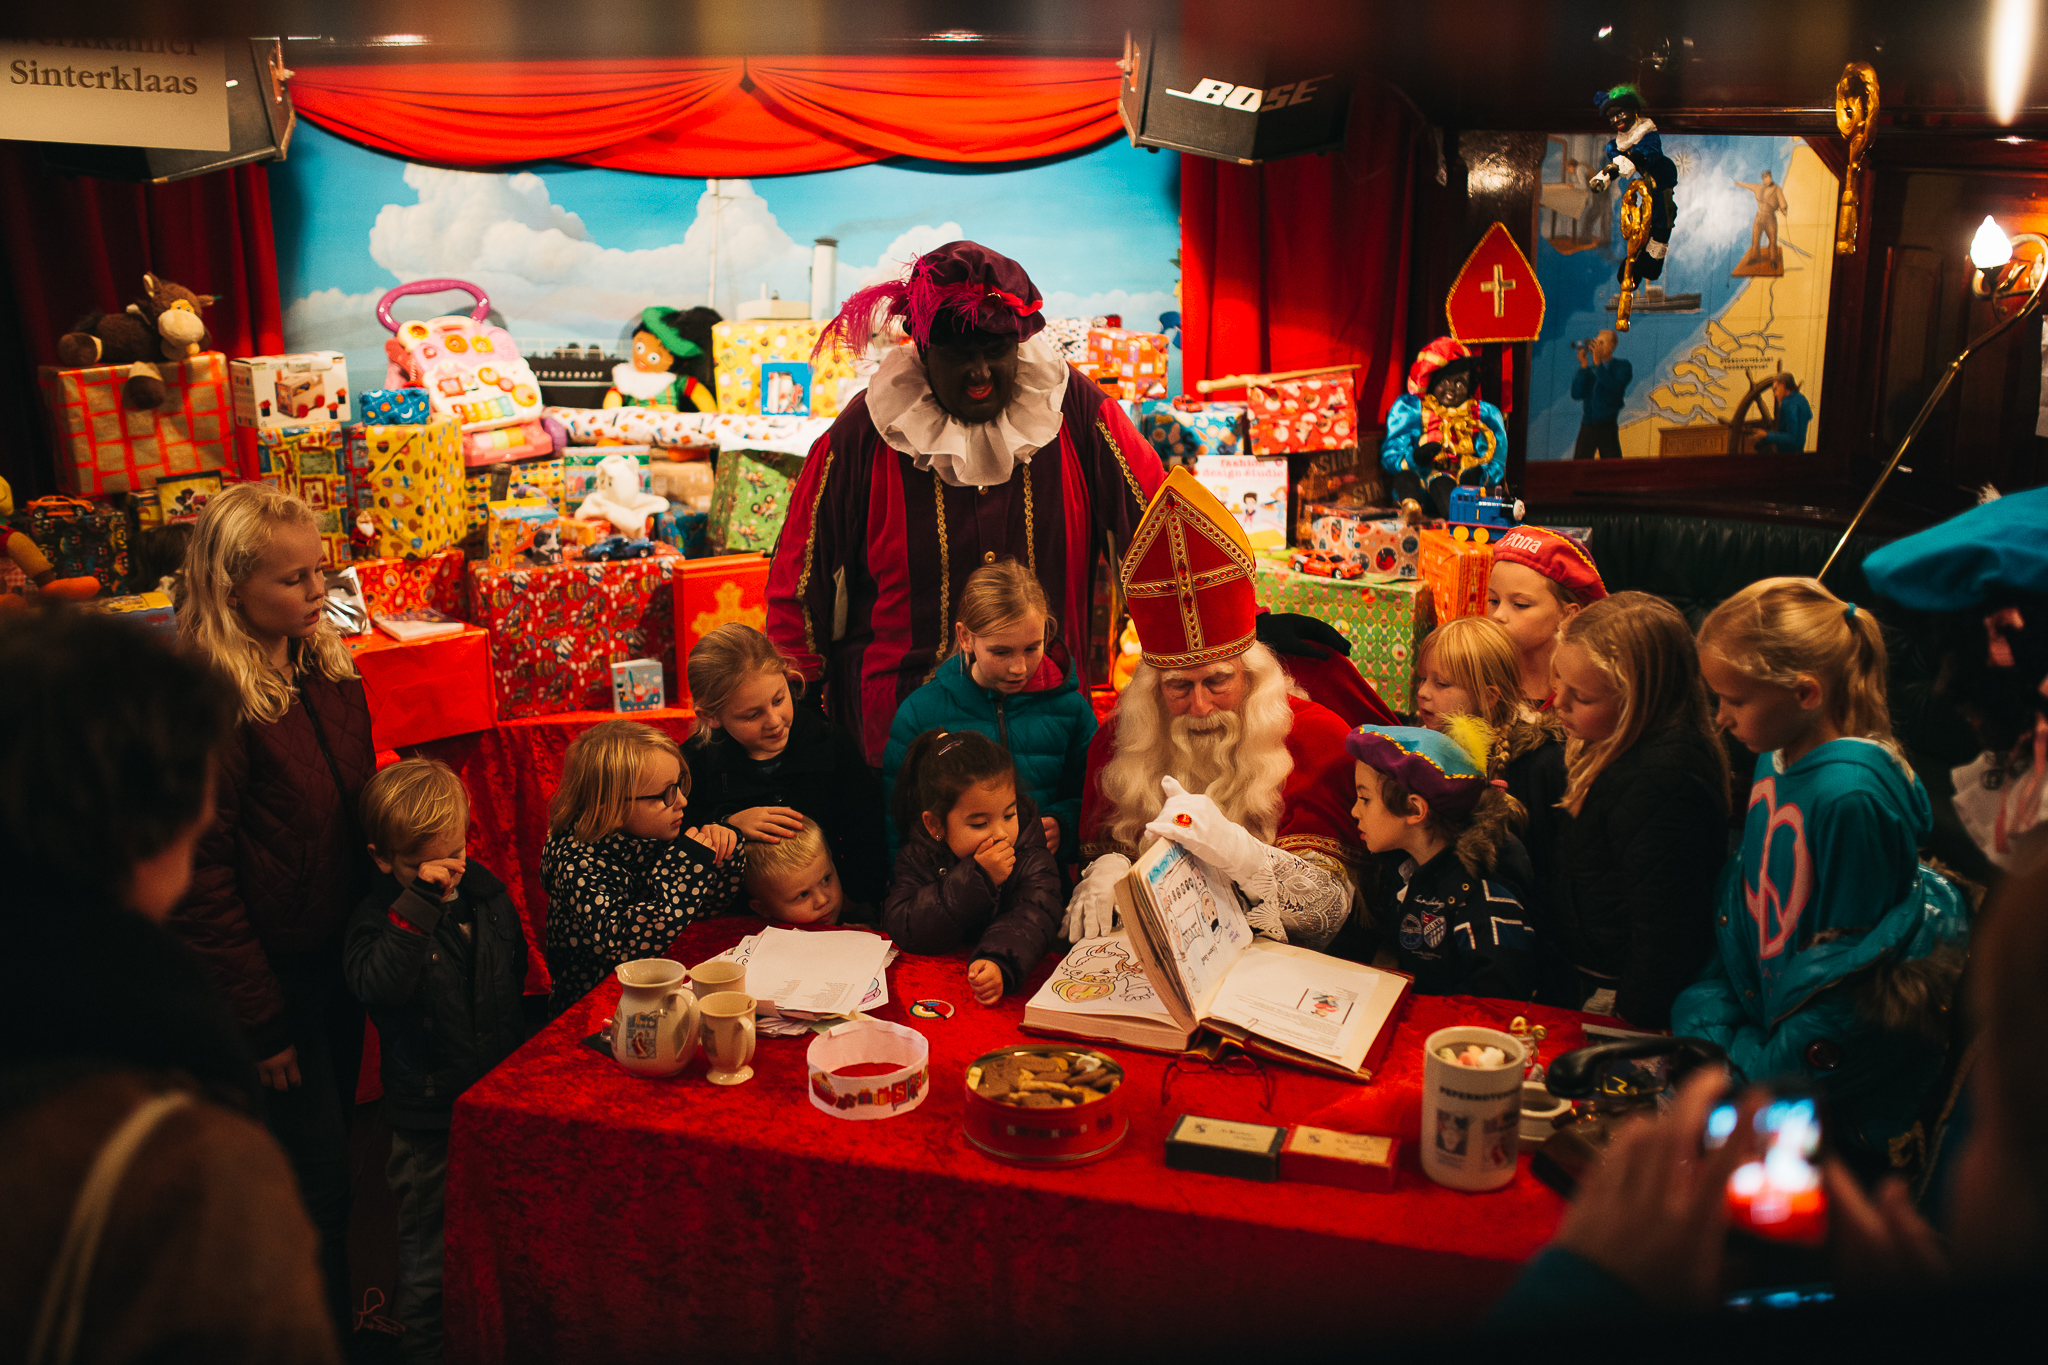 Sinterklaas S'16-10.jpg